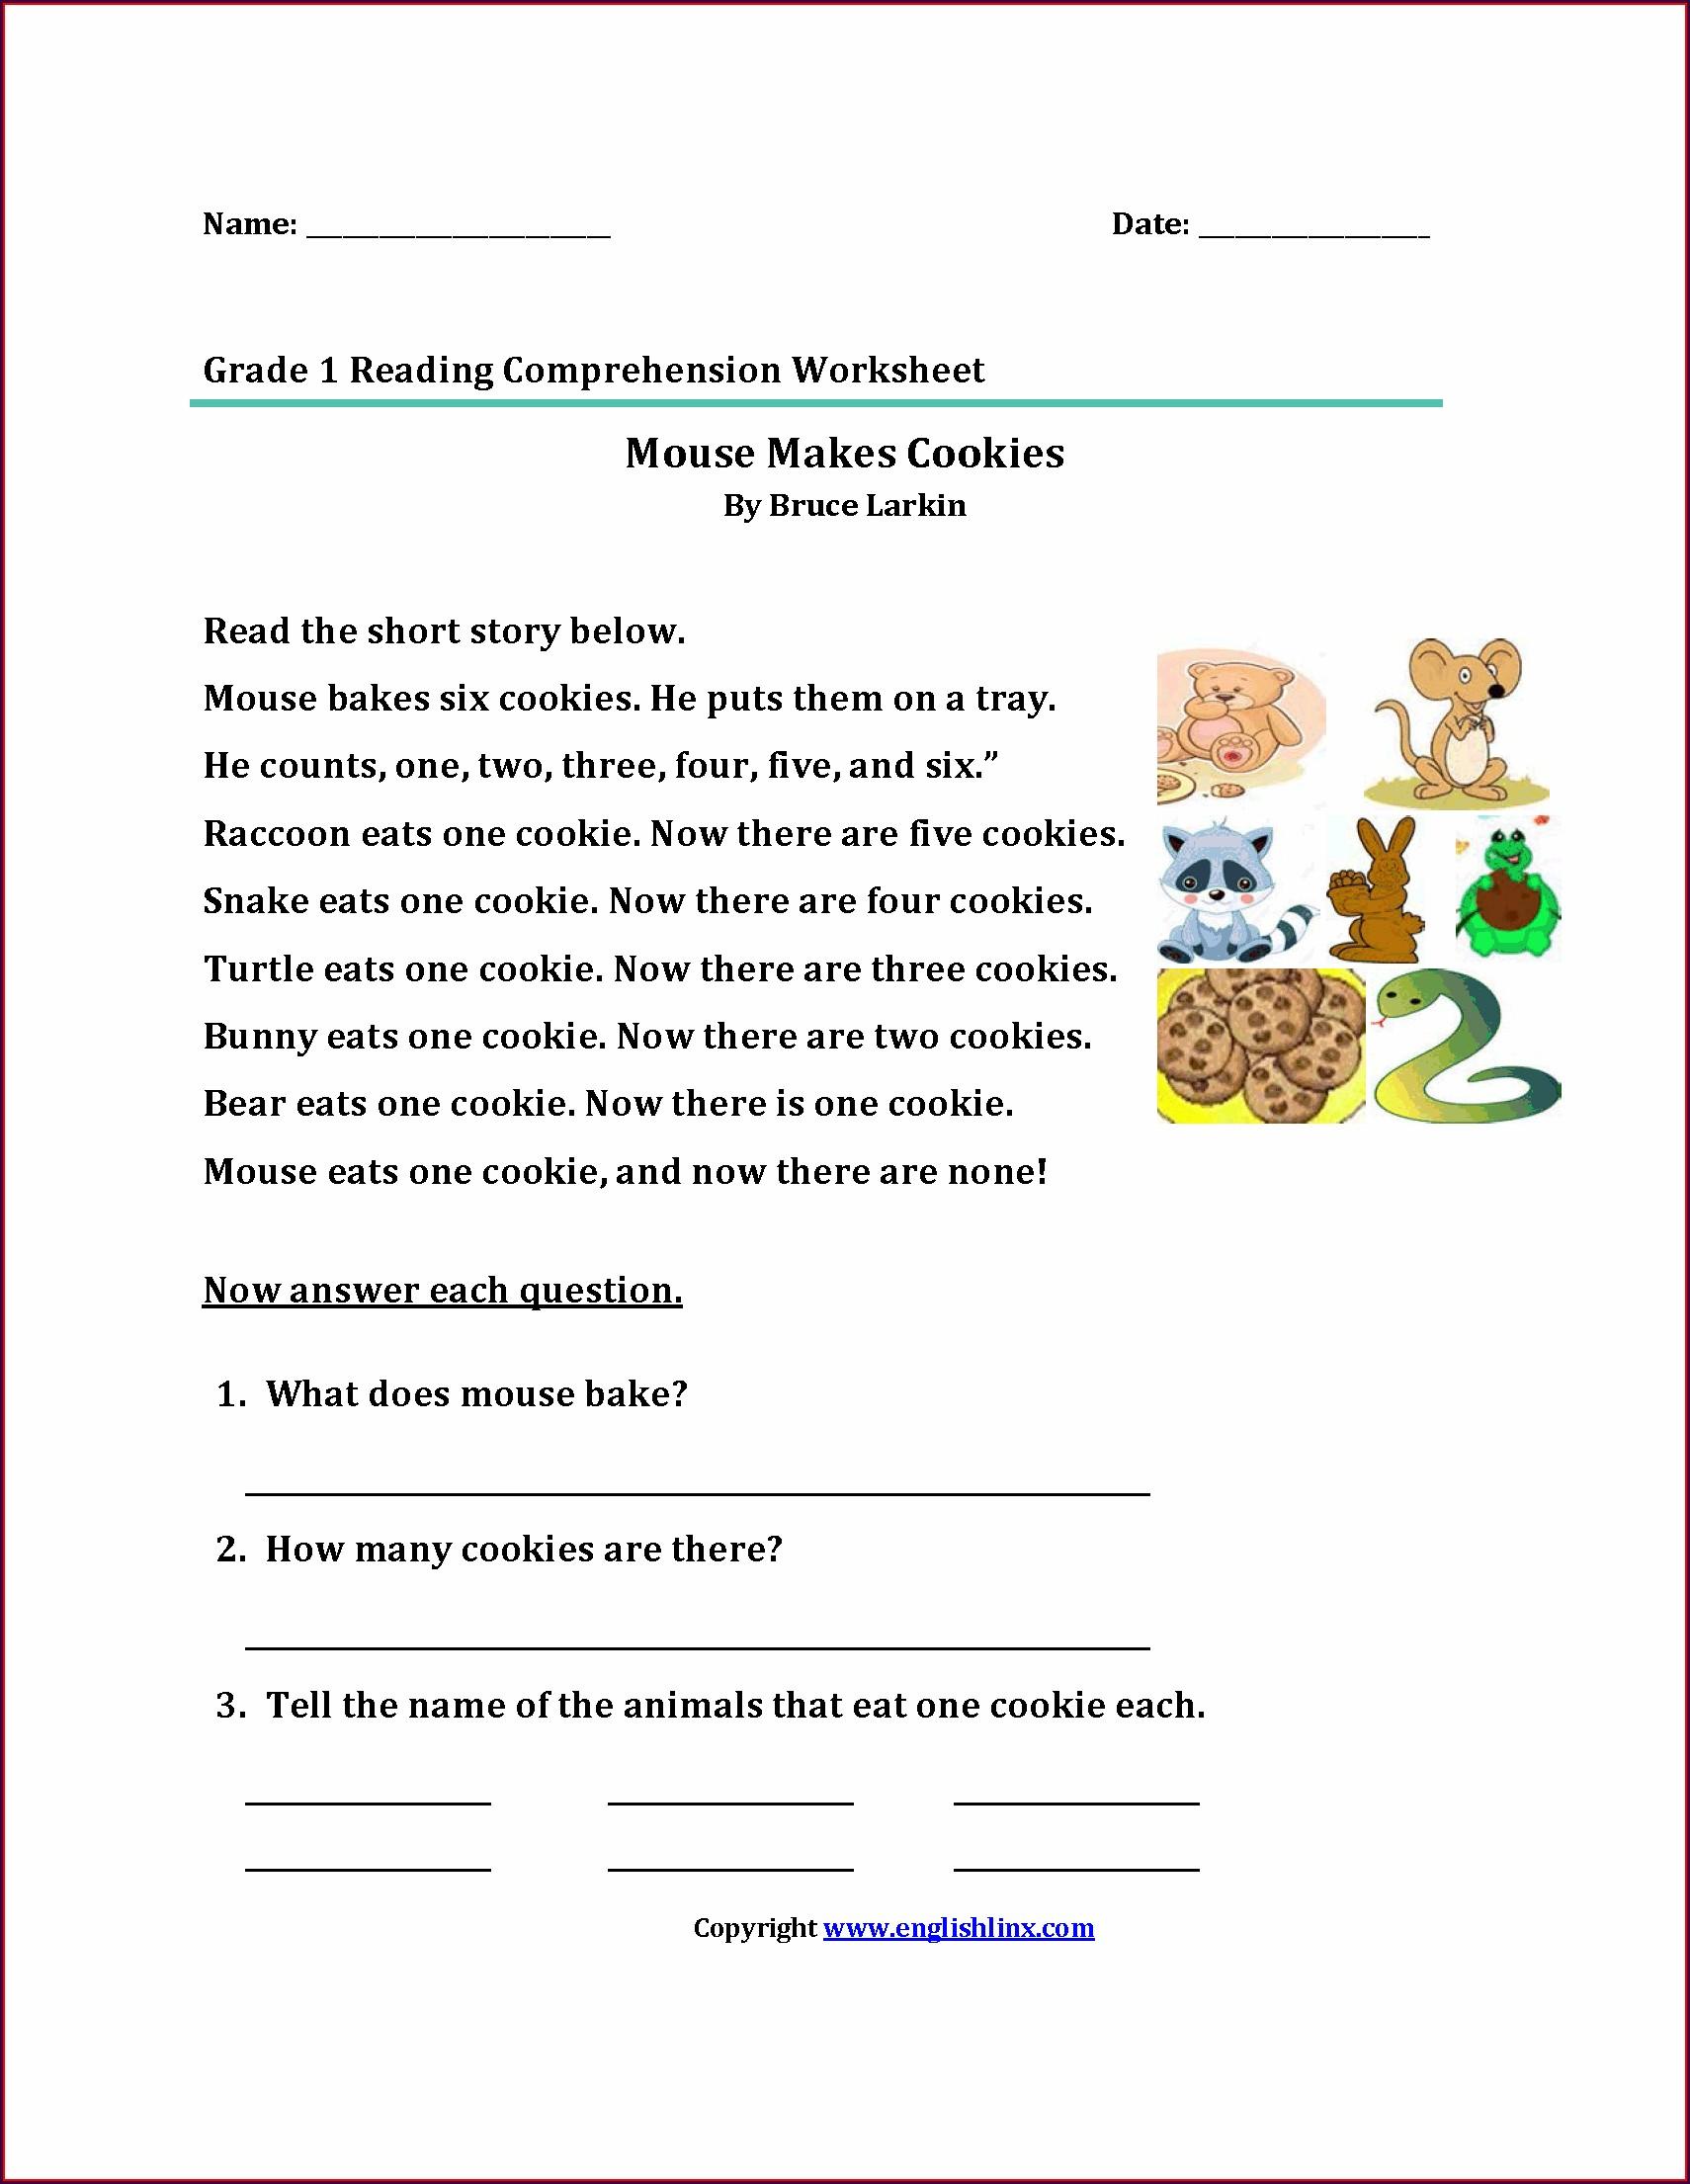 English Reading Comprehension Worksheet For Grade 1